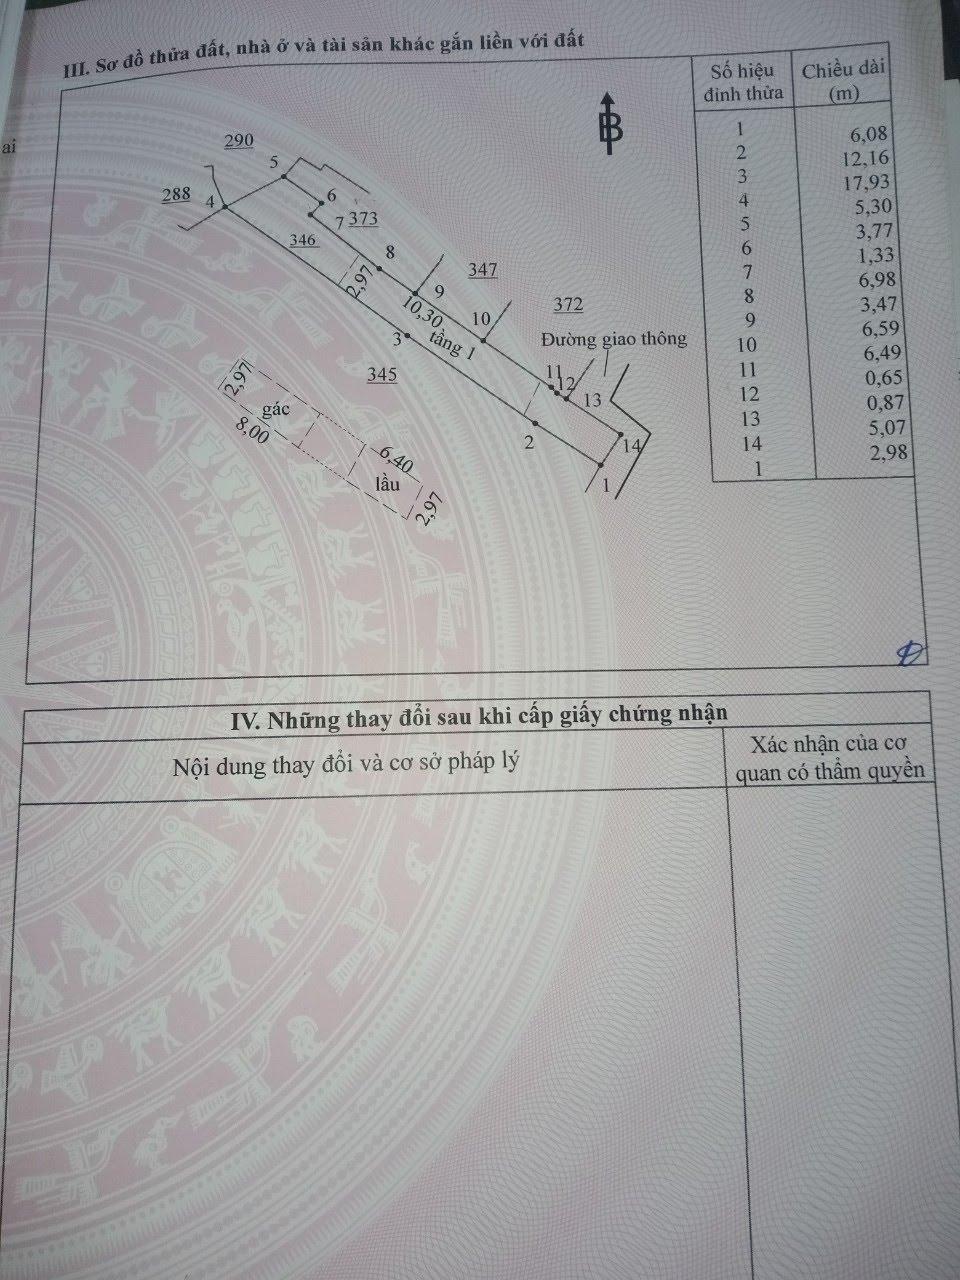 z2343096338840_5ee3eb842ea9ff6c4f124da33cc3fdf8.jpg